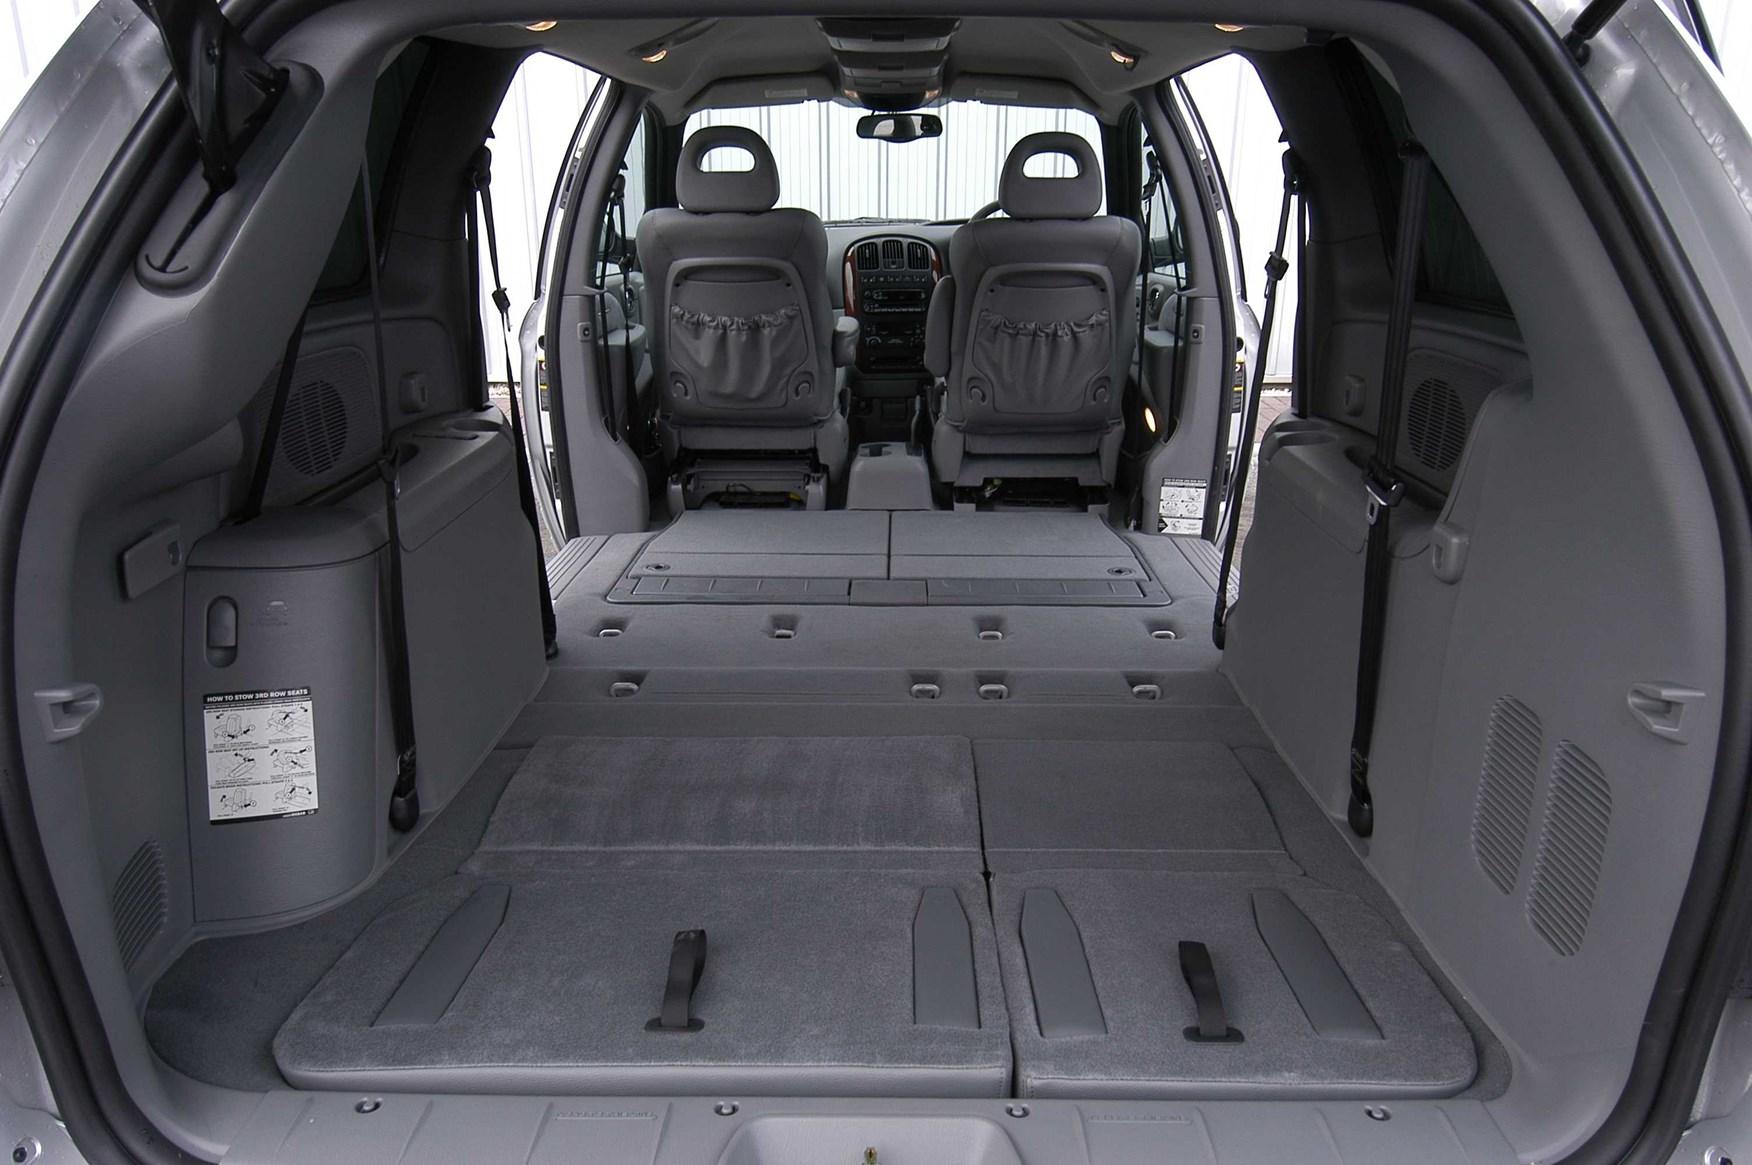 2018 Grand Caravan >> Chrysler Grand Voyager Estate Review (2001 - 2008) | Parkers